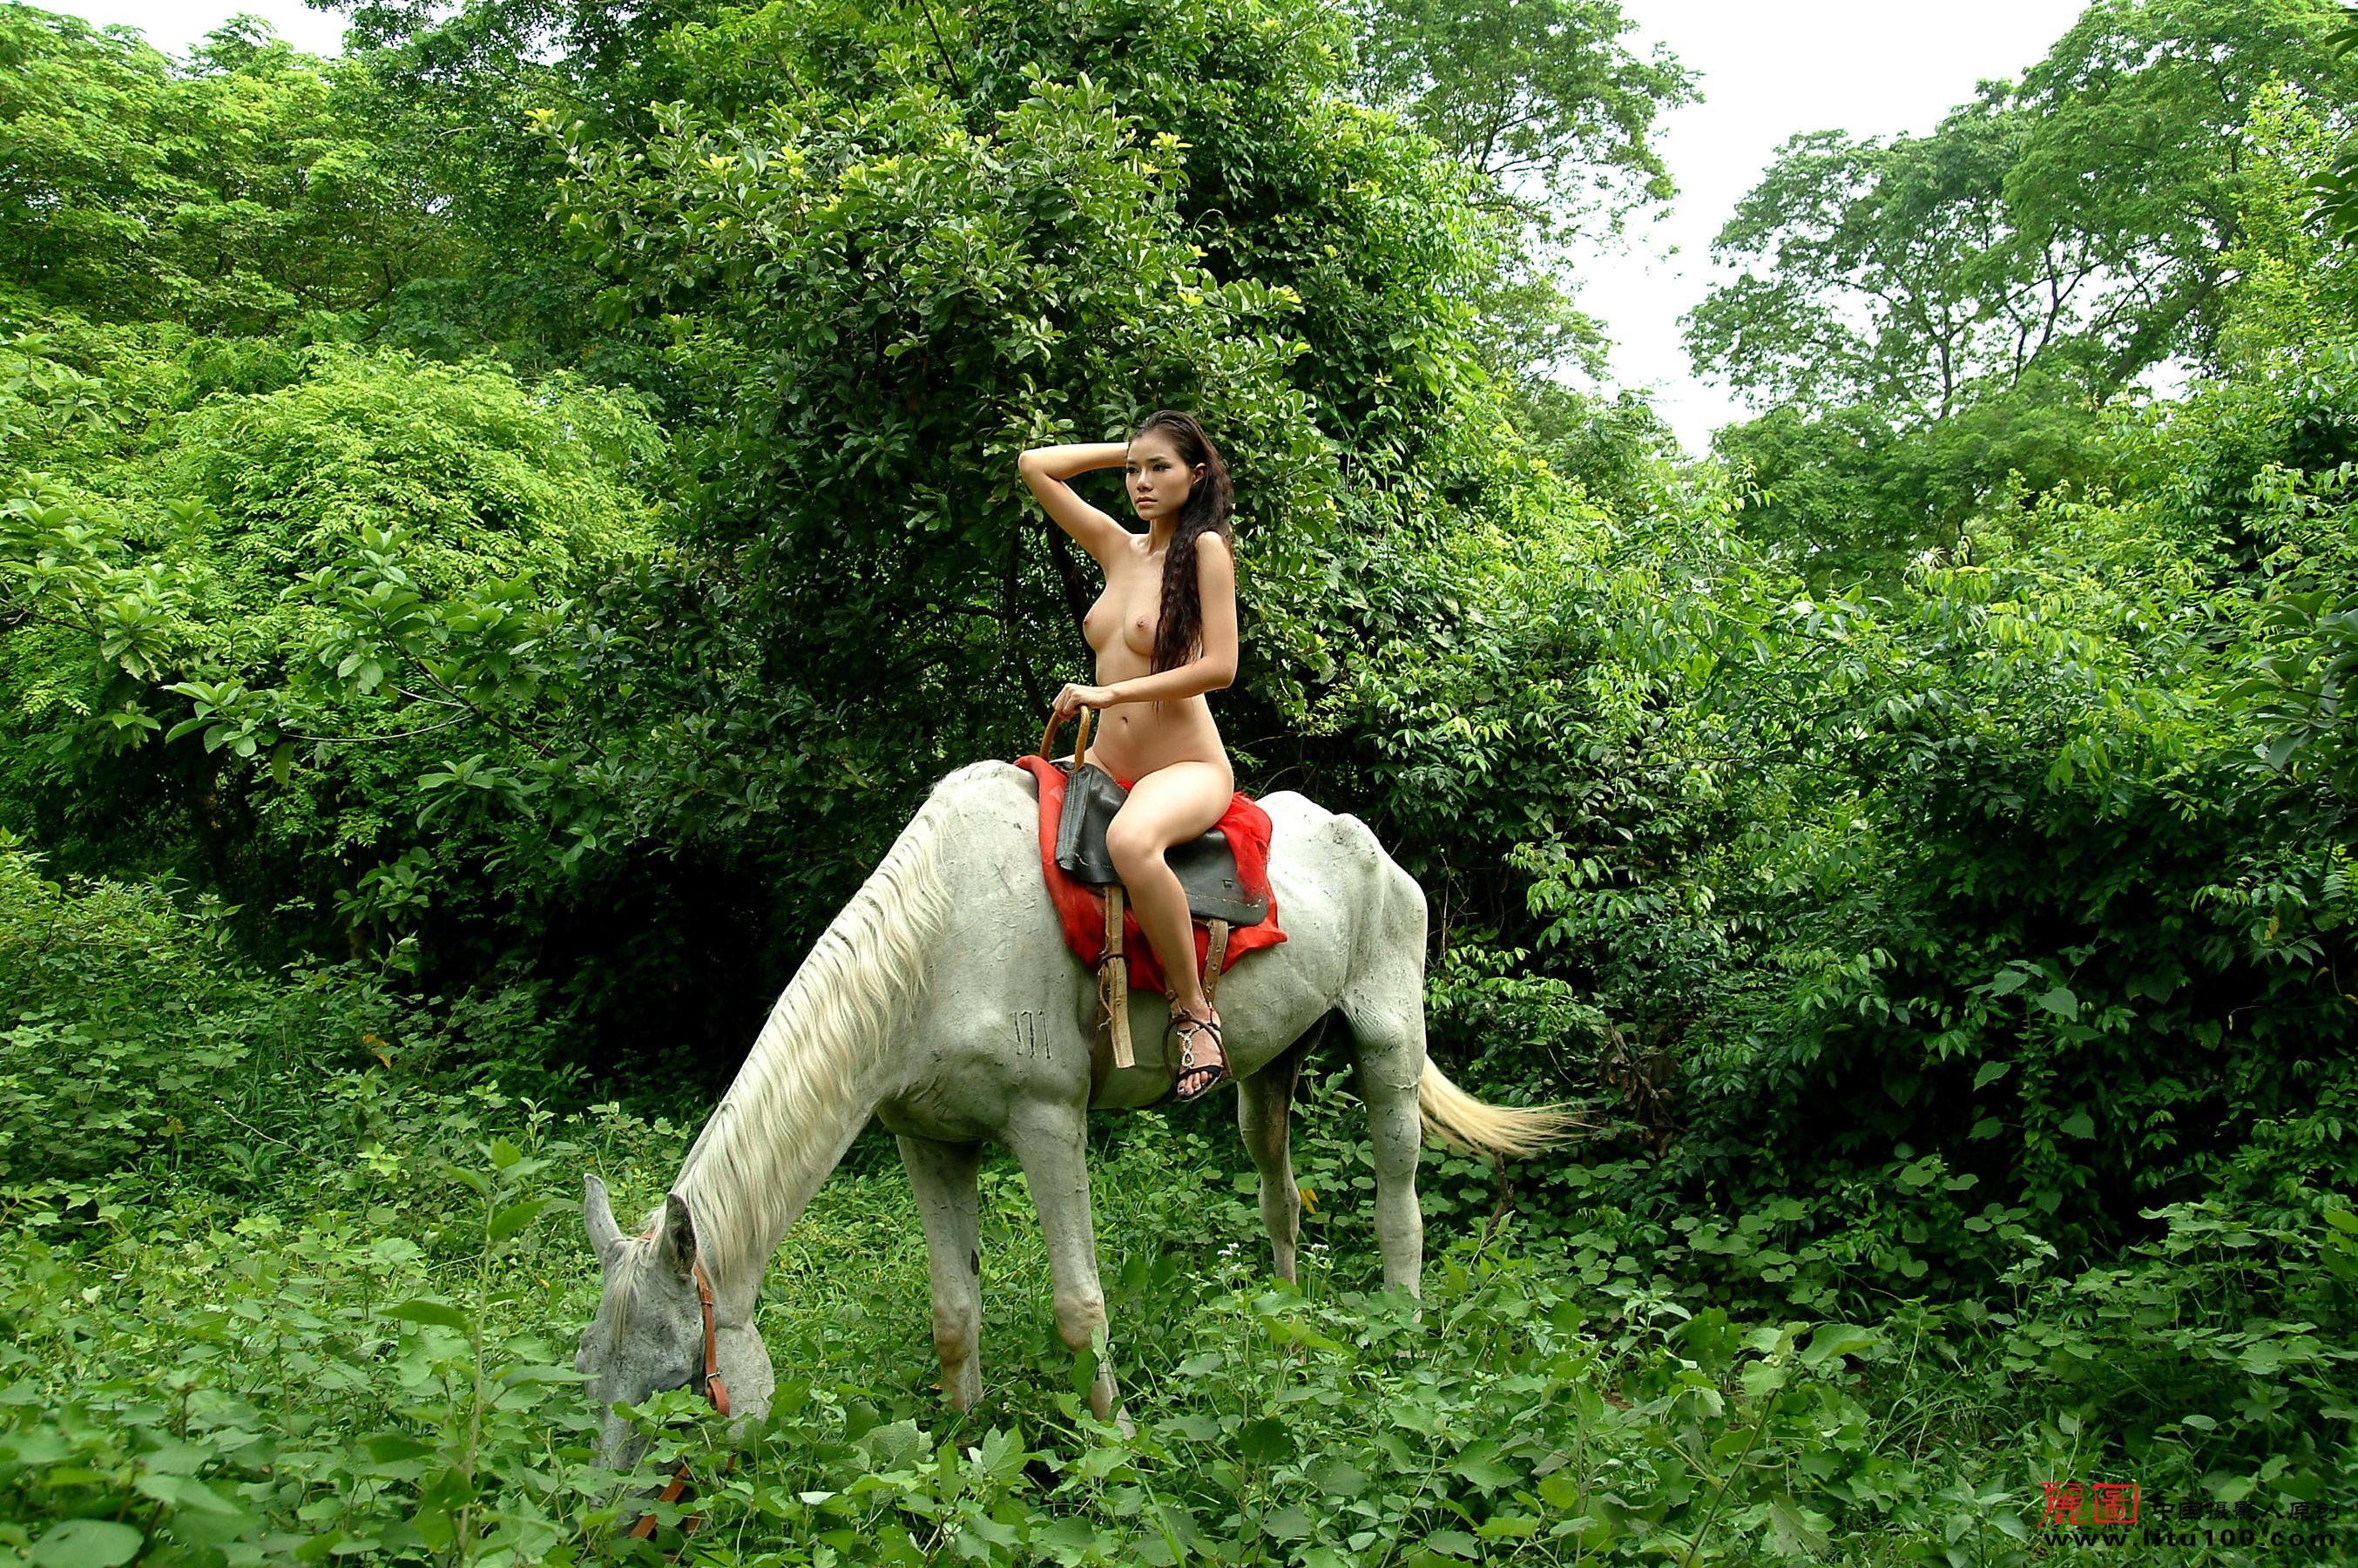 301 Moved Permanently: glamourasia.wordpress.com/2012/03/08/nude-horse-riding